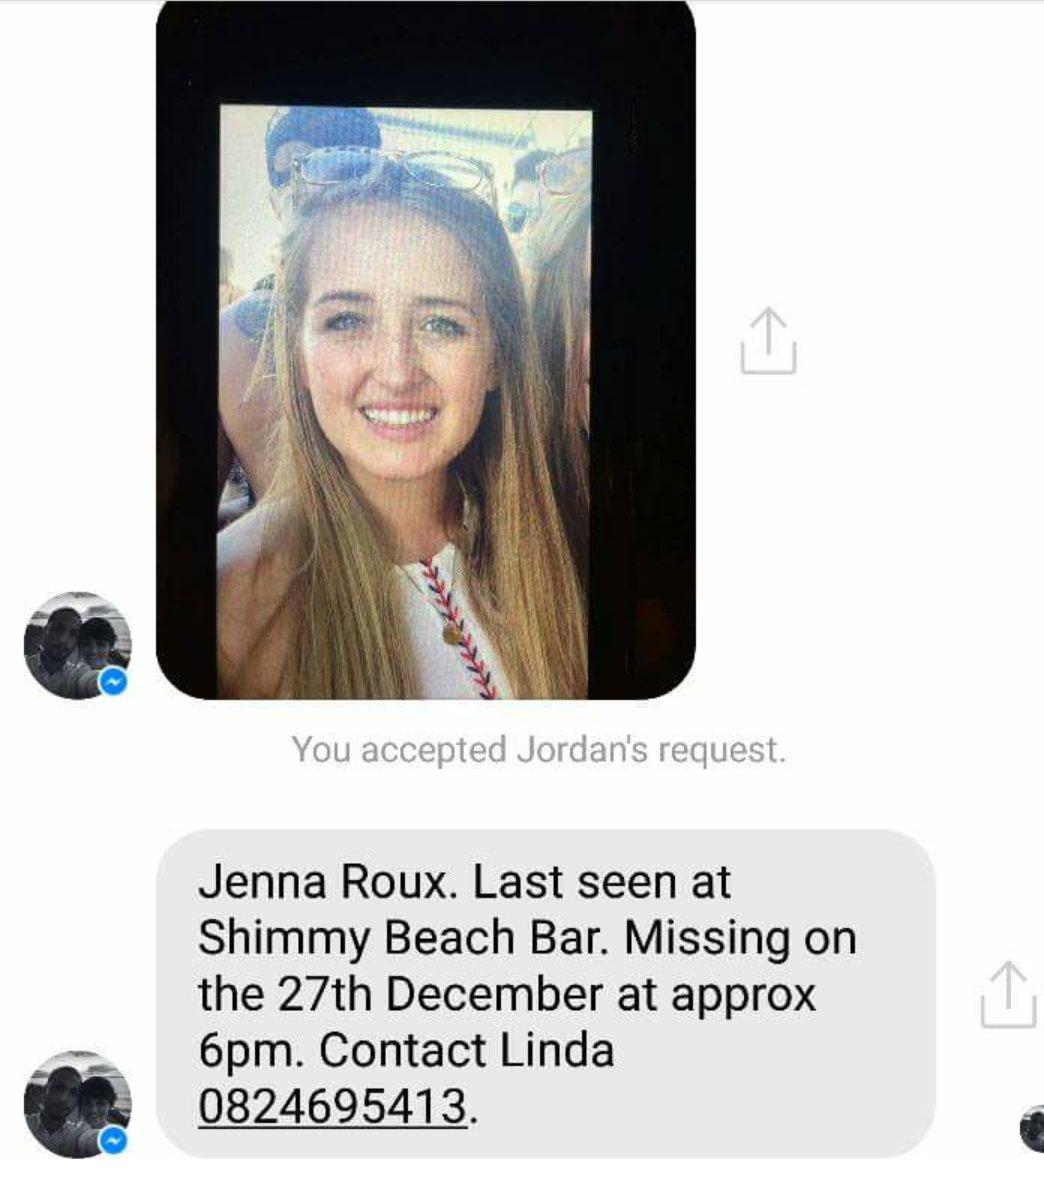 MISSING: Jenna Roux #HelpFindJenna #JennaRoux  @RyanOConnorZA @Abramjee @MrCPT @KFMza @LifeisSavage @MyCityByNight https://t.co/cwahUEs5cD